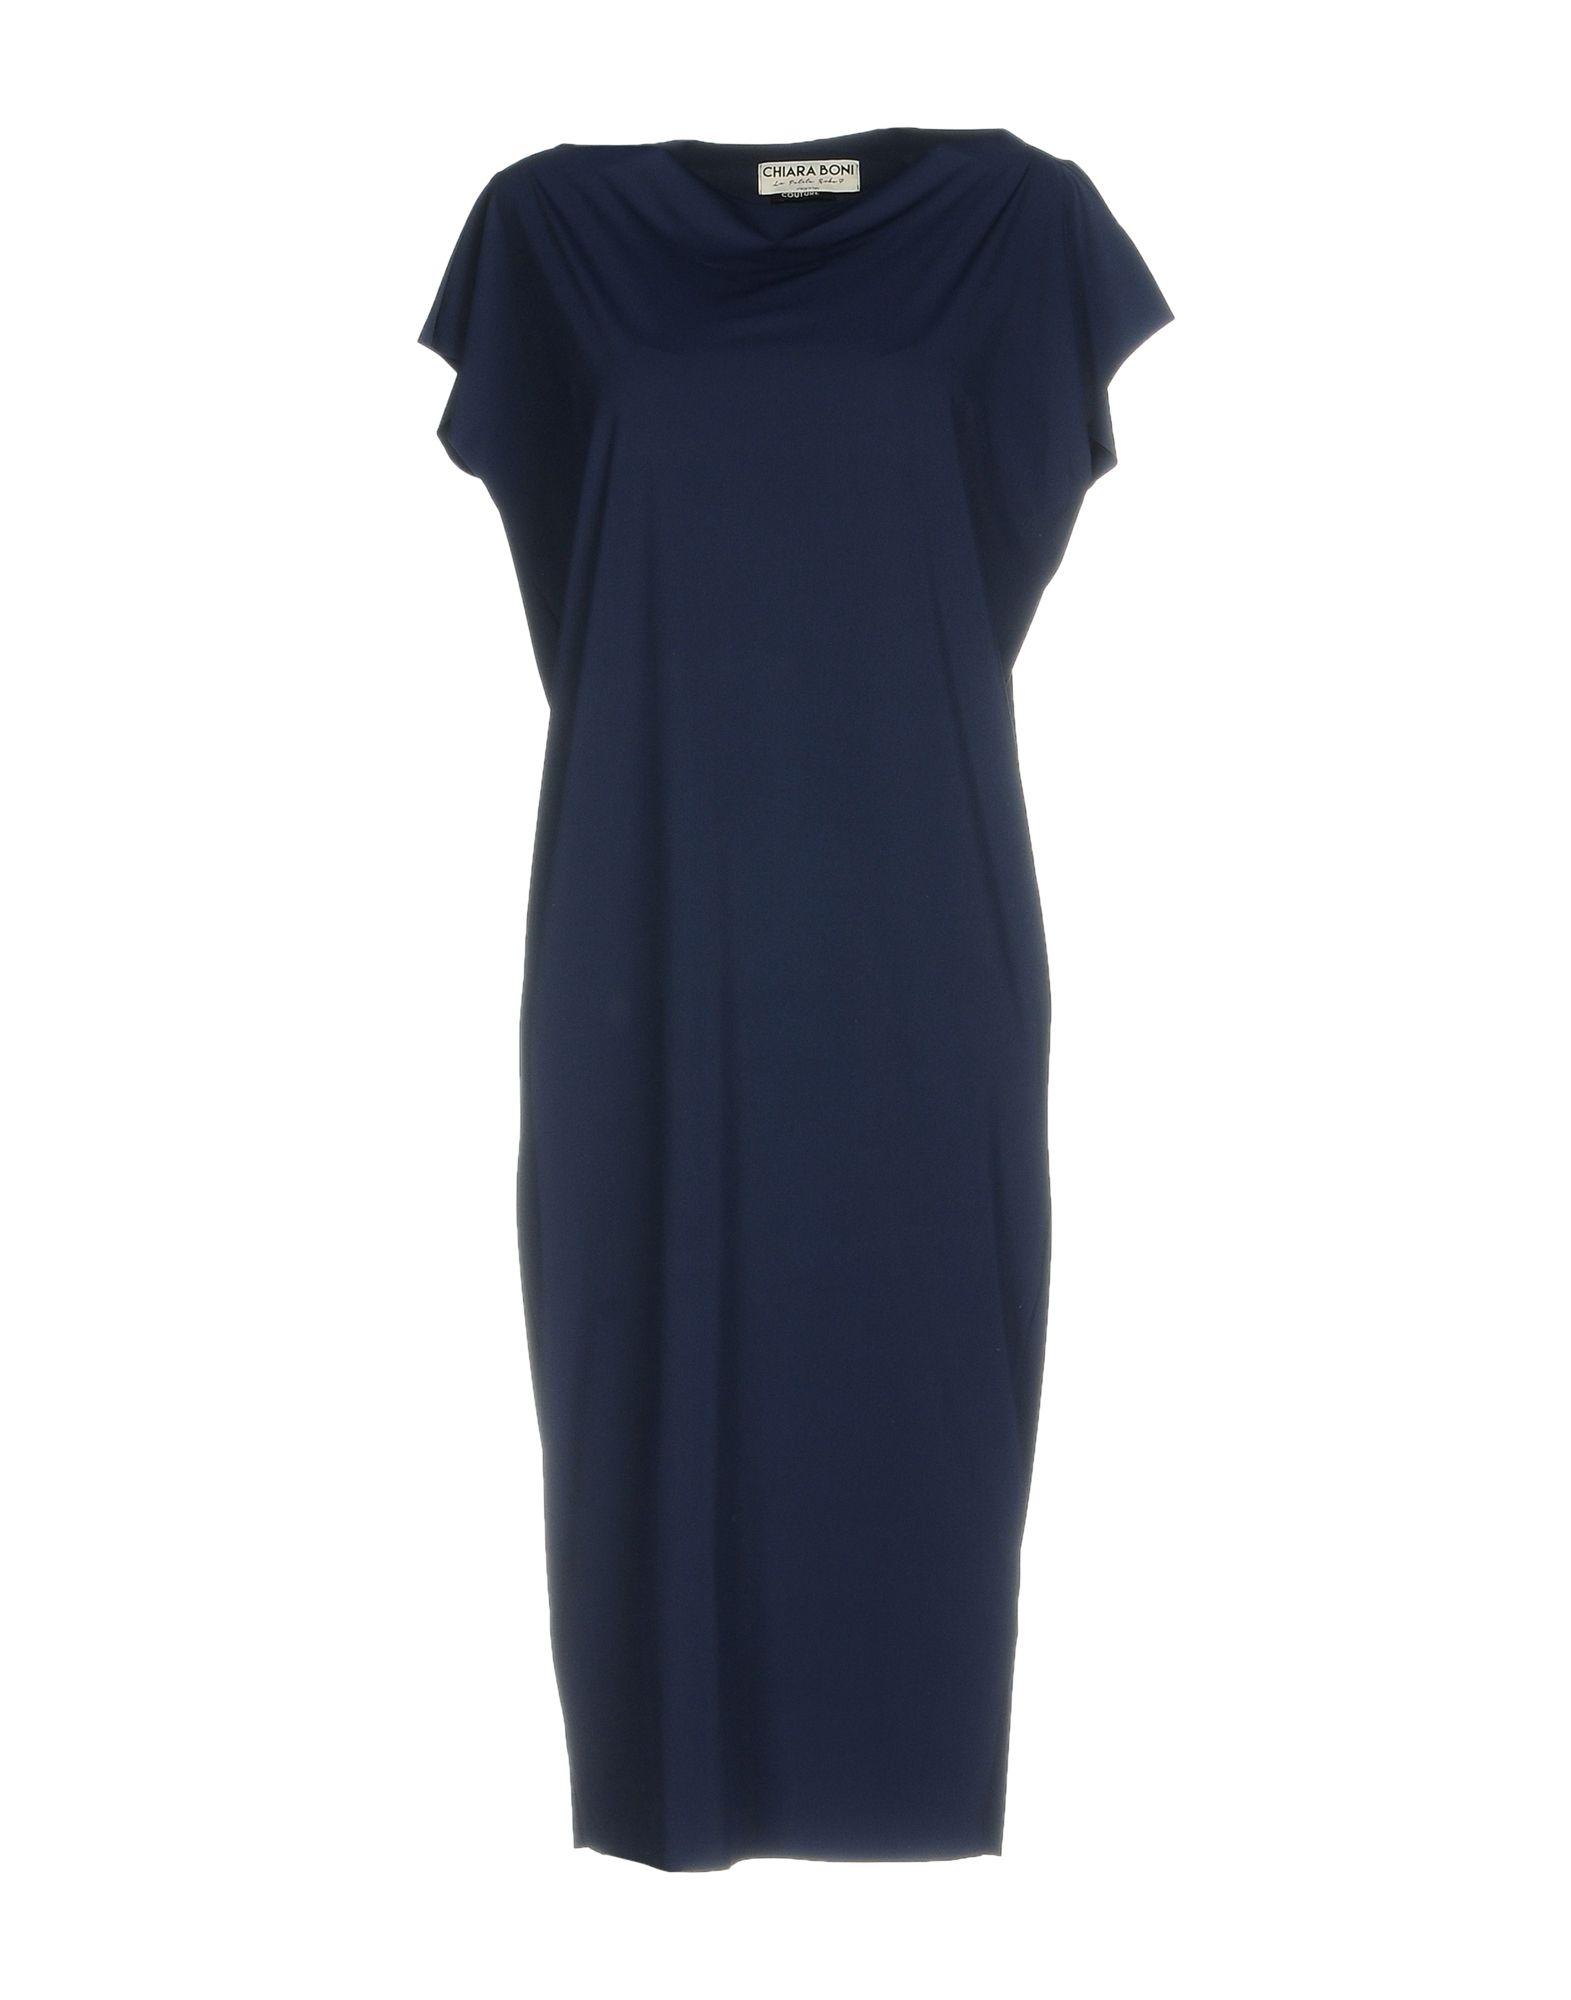 CHIARA BONI Knee-Length Dress in Dark Blue